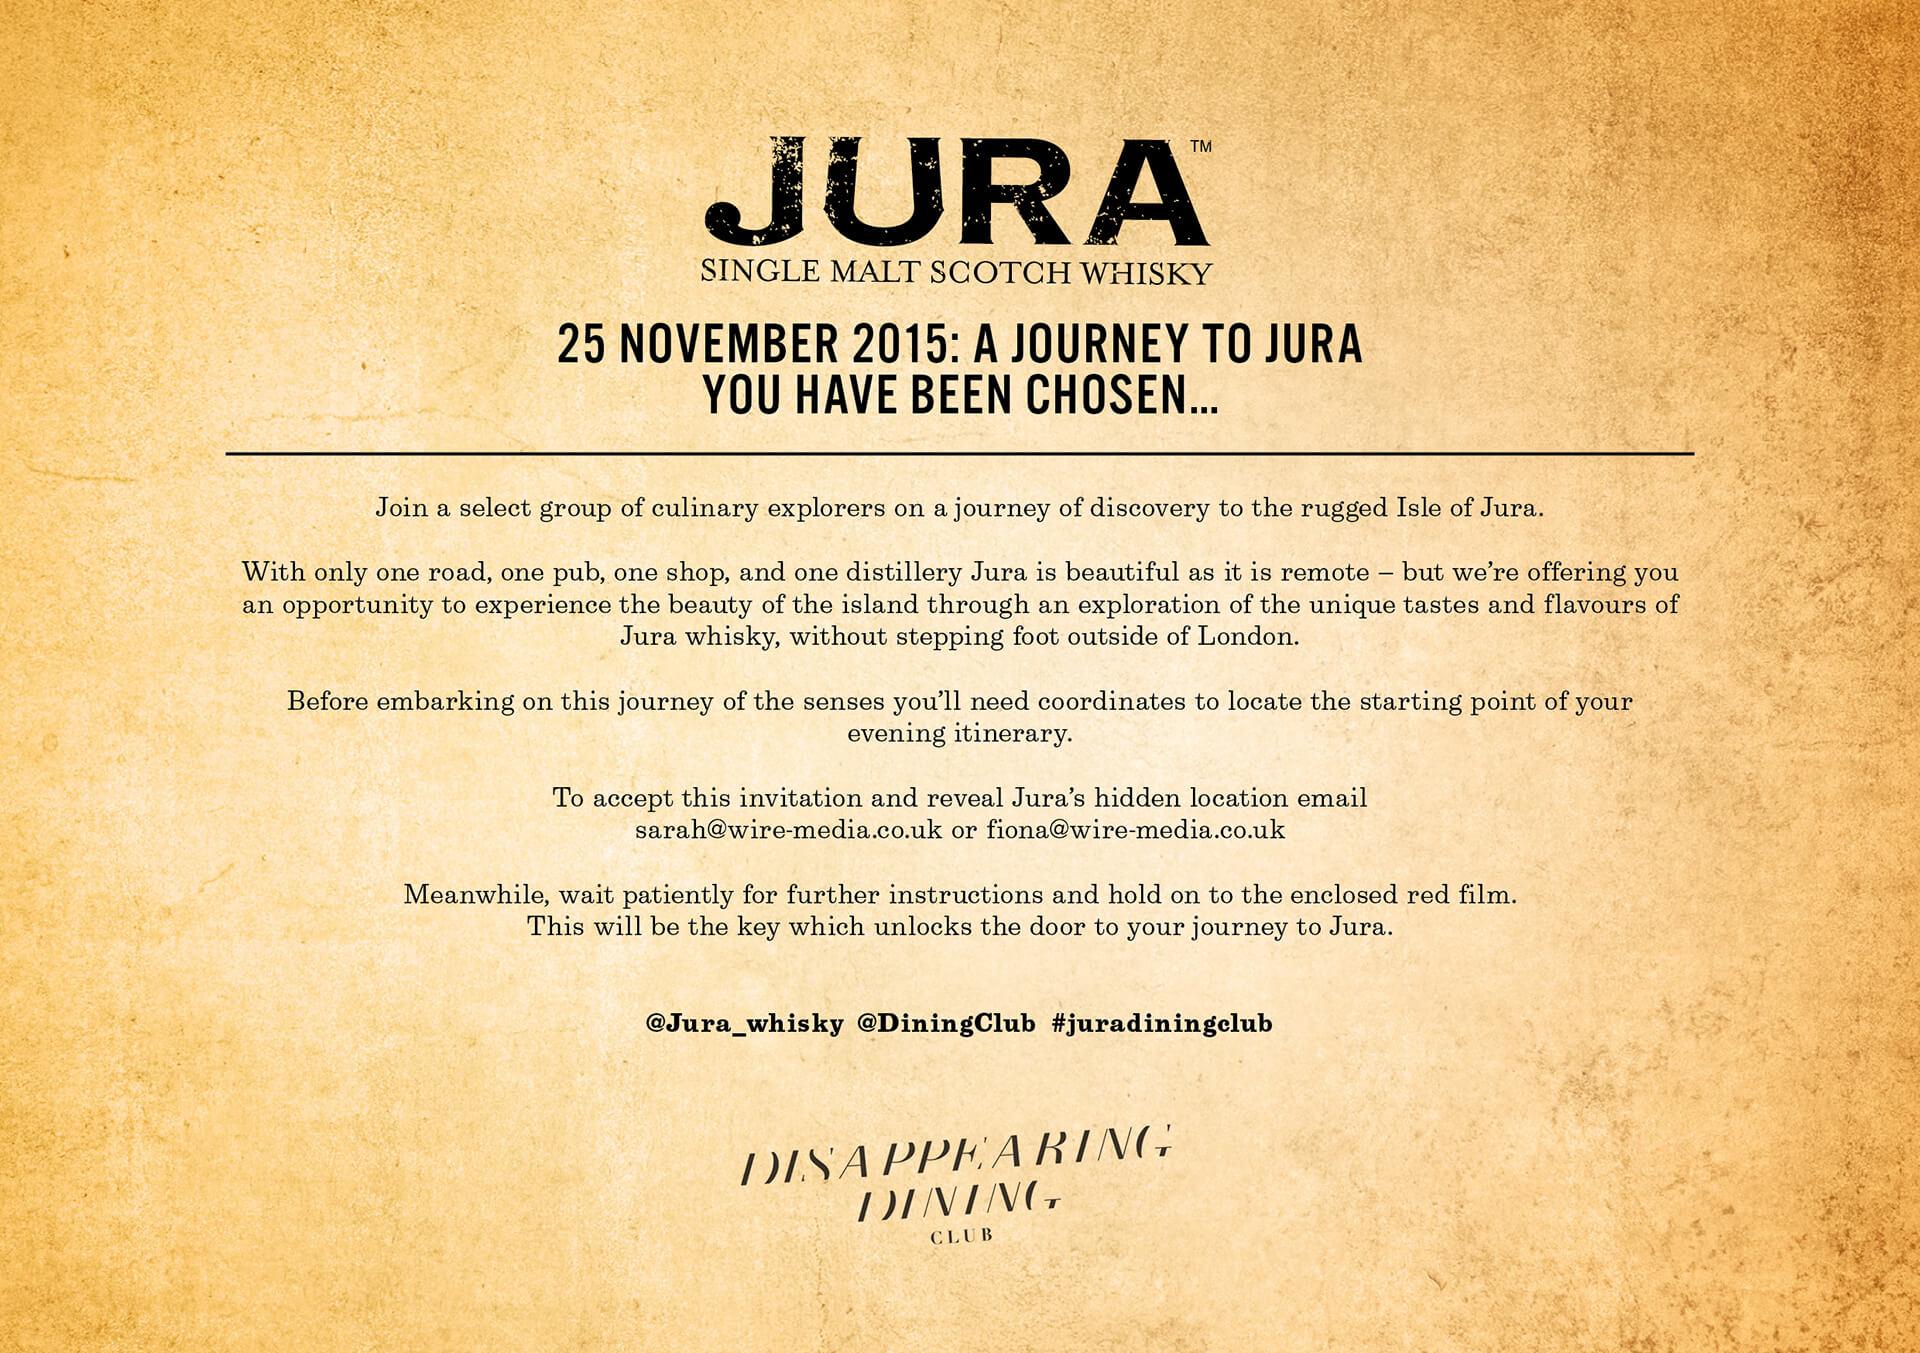 Journey to Jura